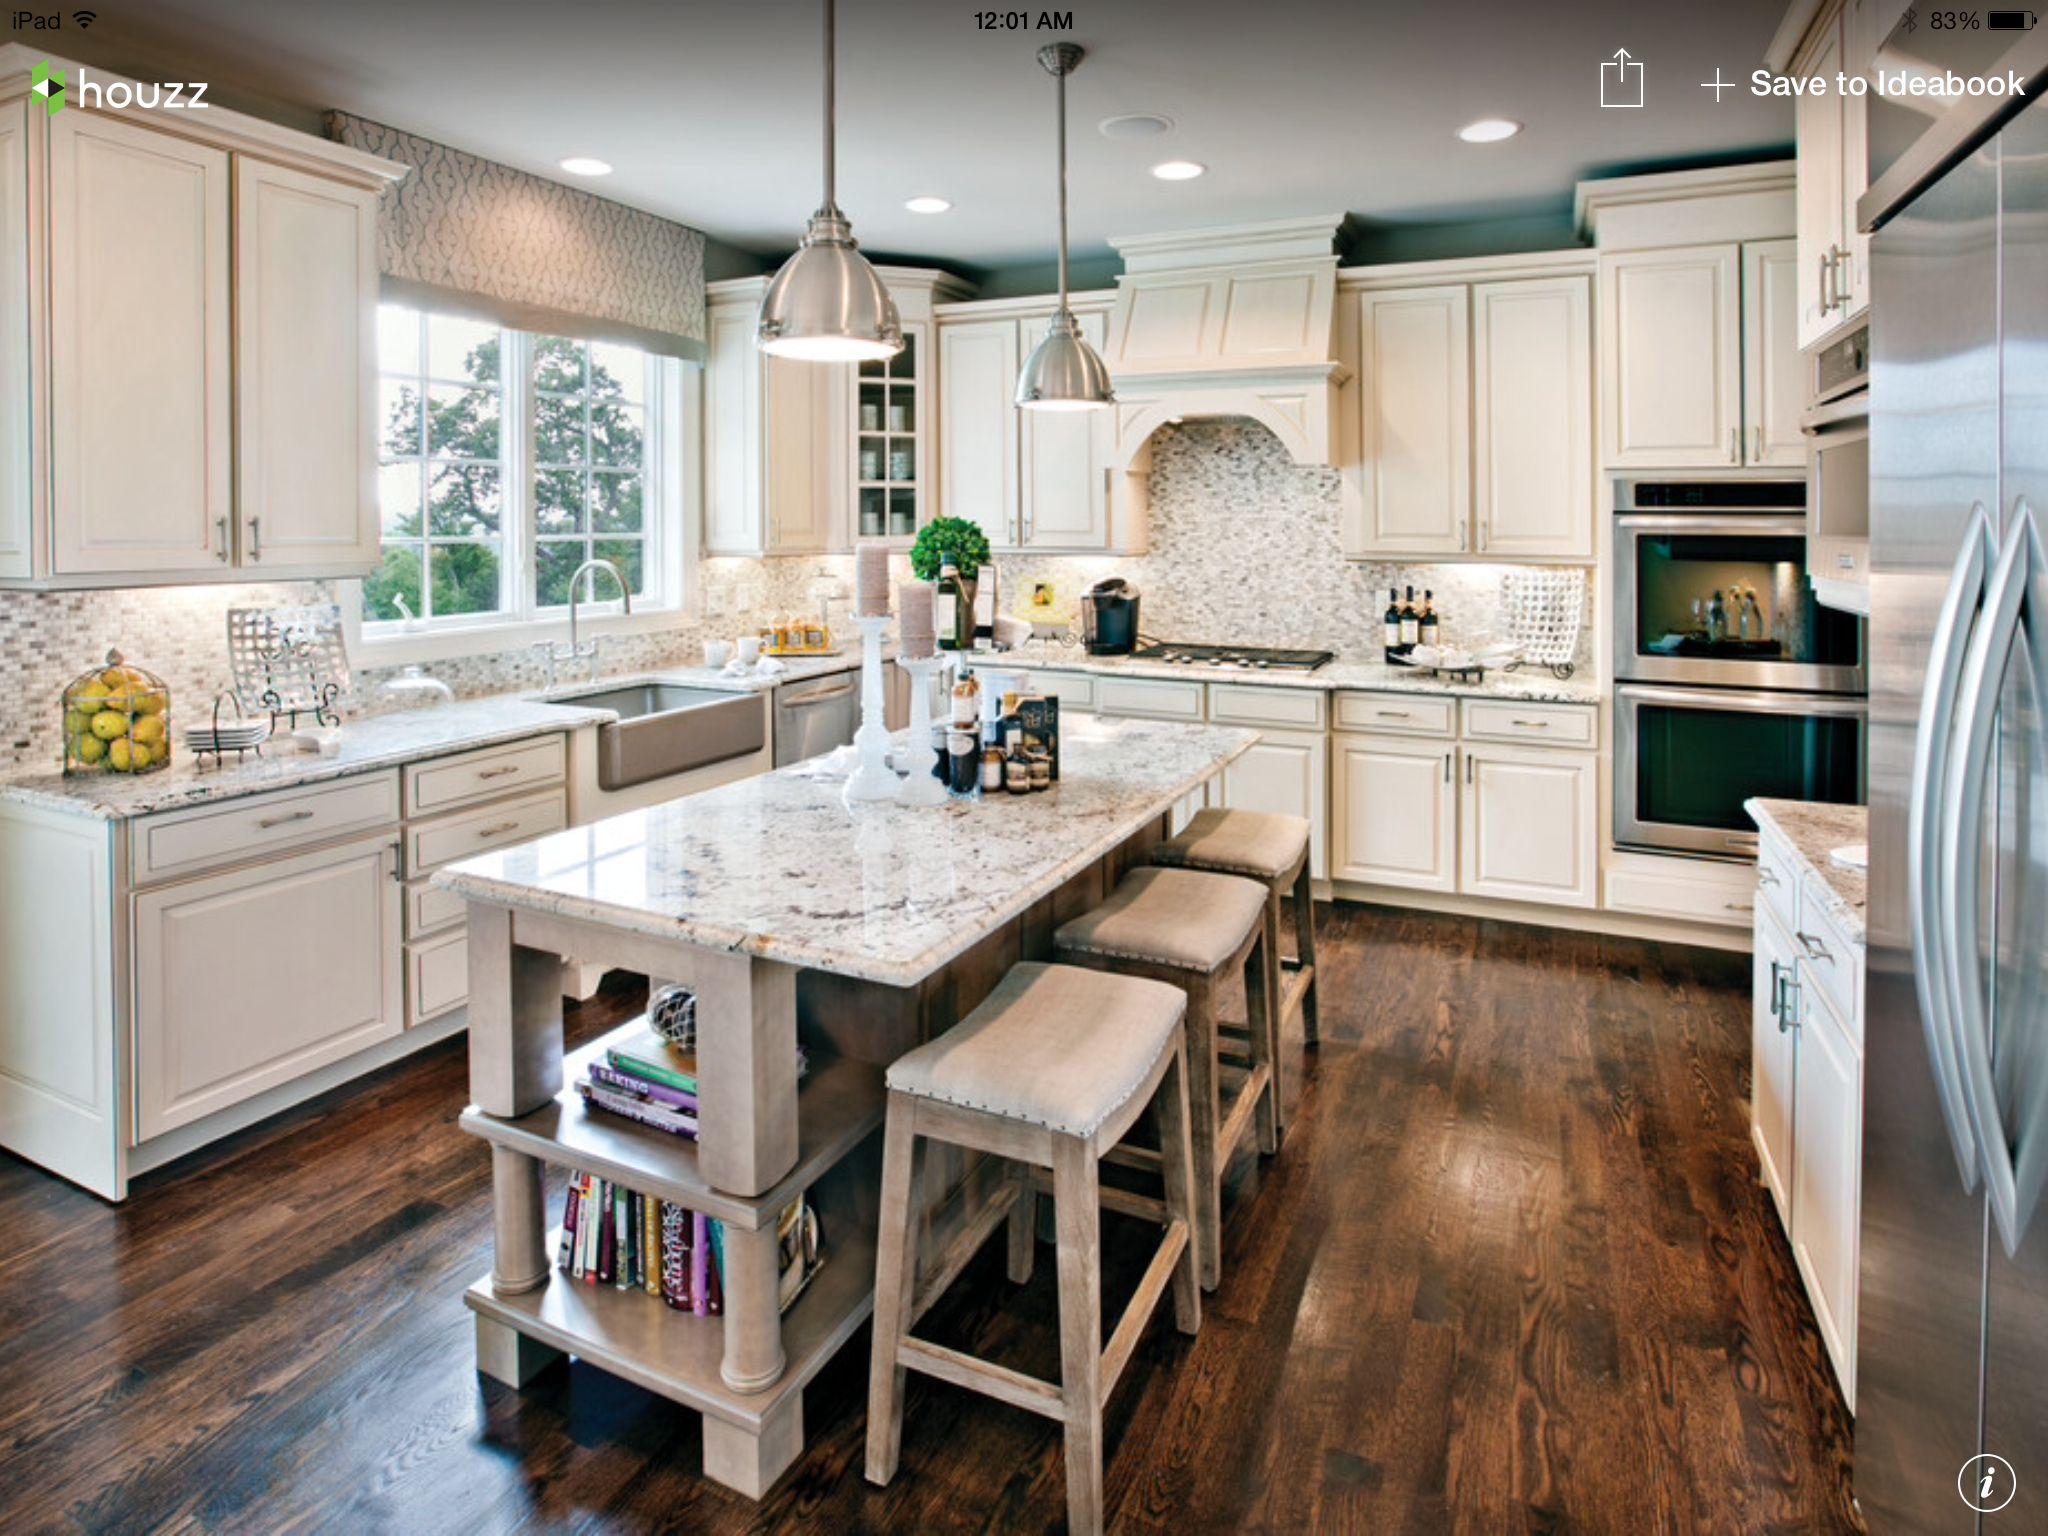 Wide Plank Hardwood Floors White Cabinets Light Granite Countertops Houzz